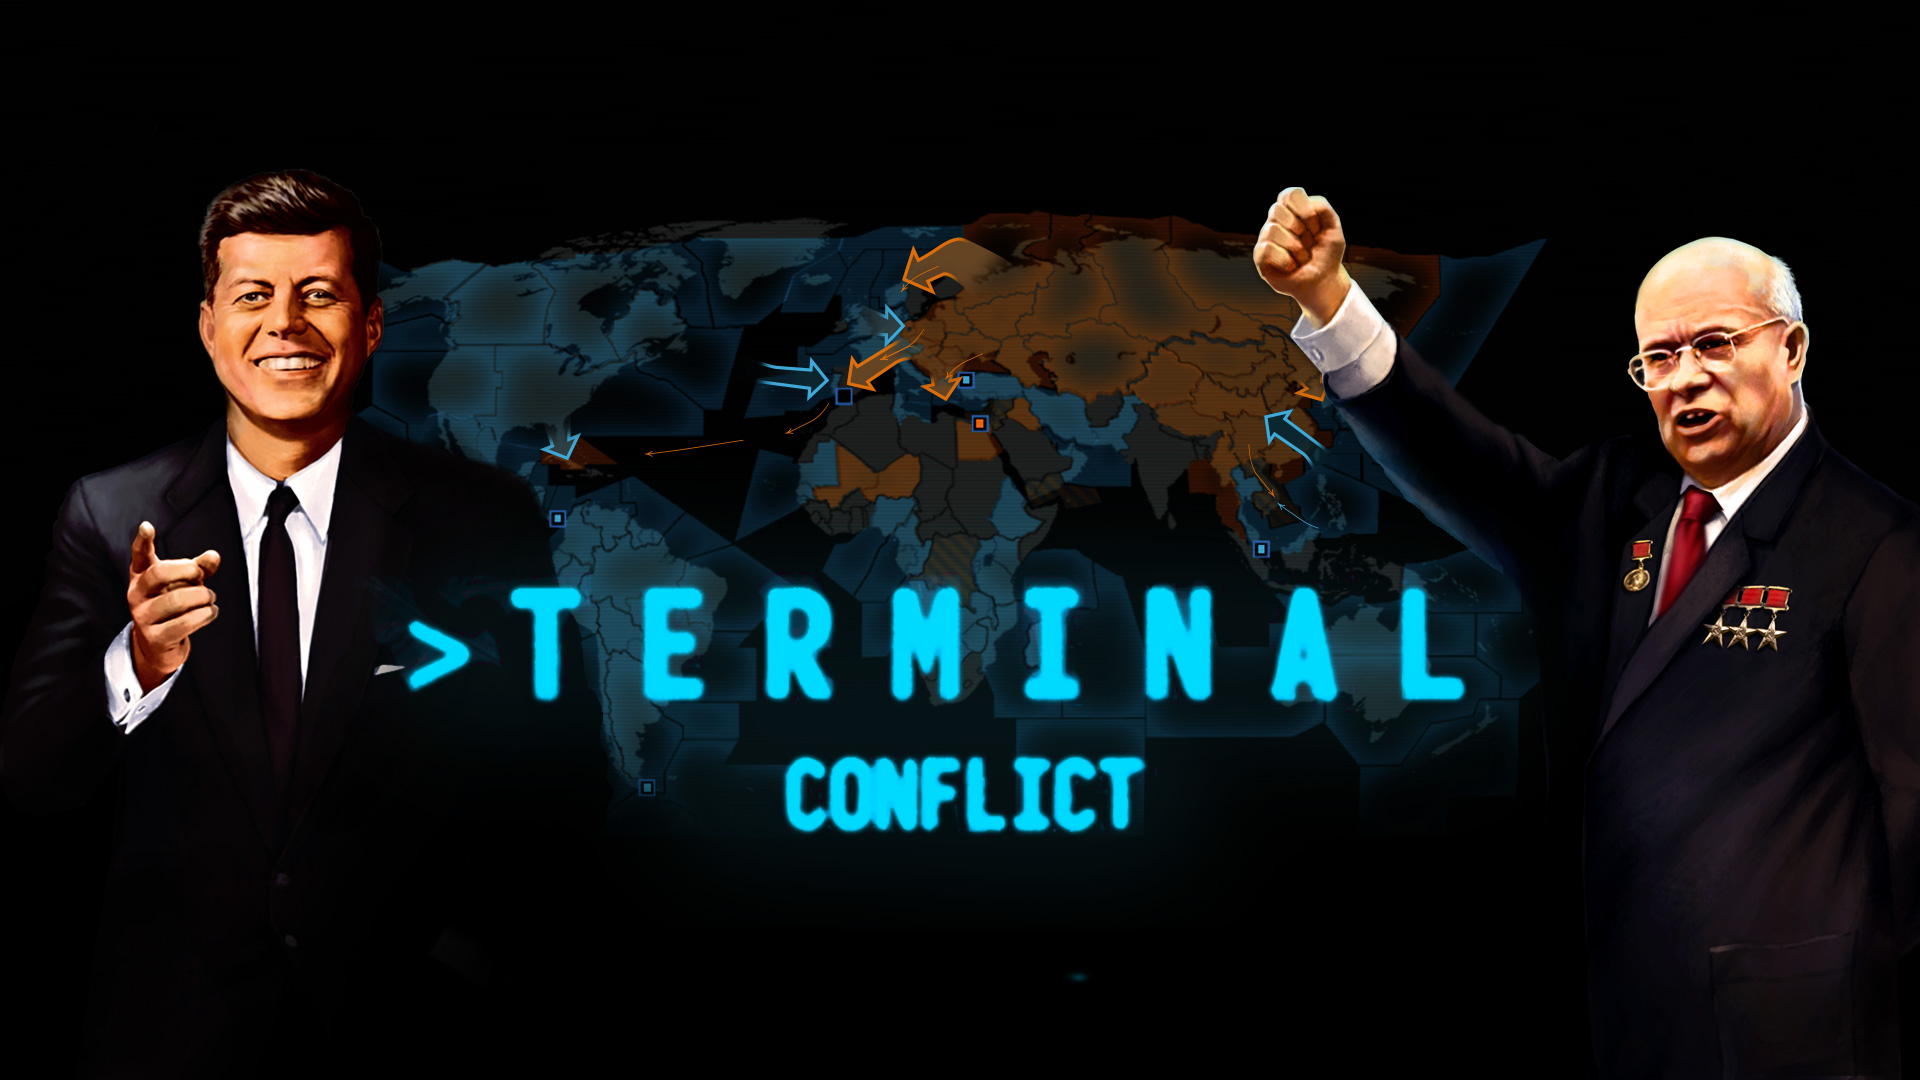 TerminalConflict BetaBig